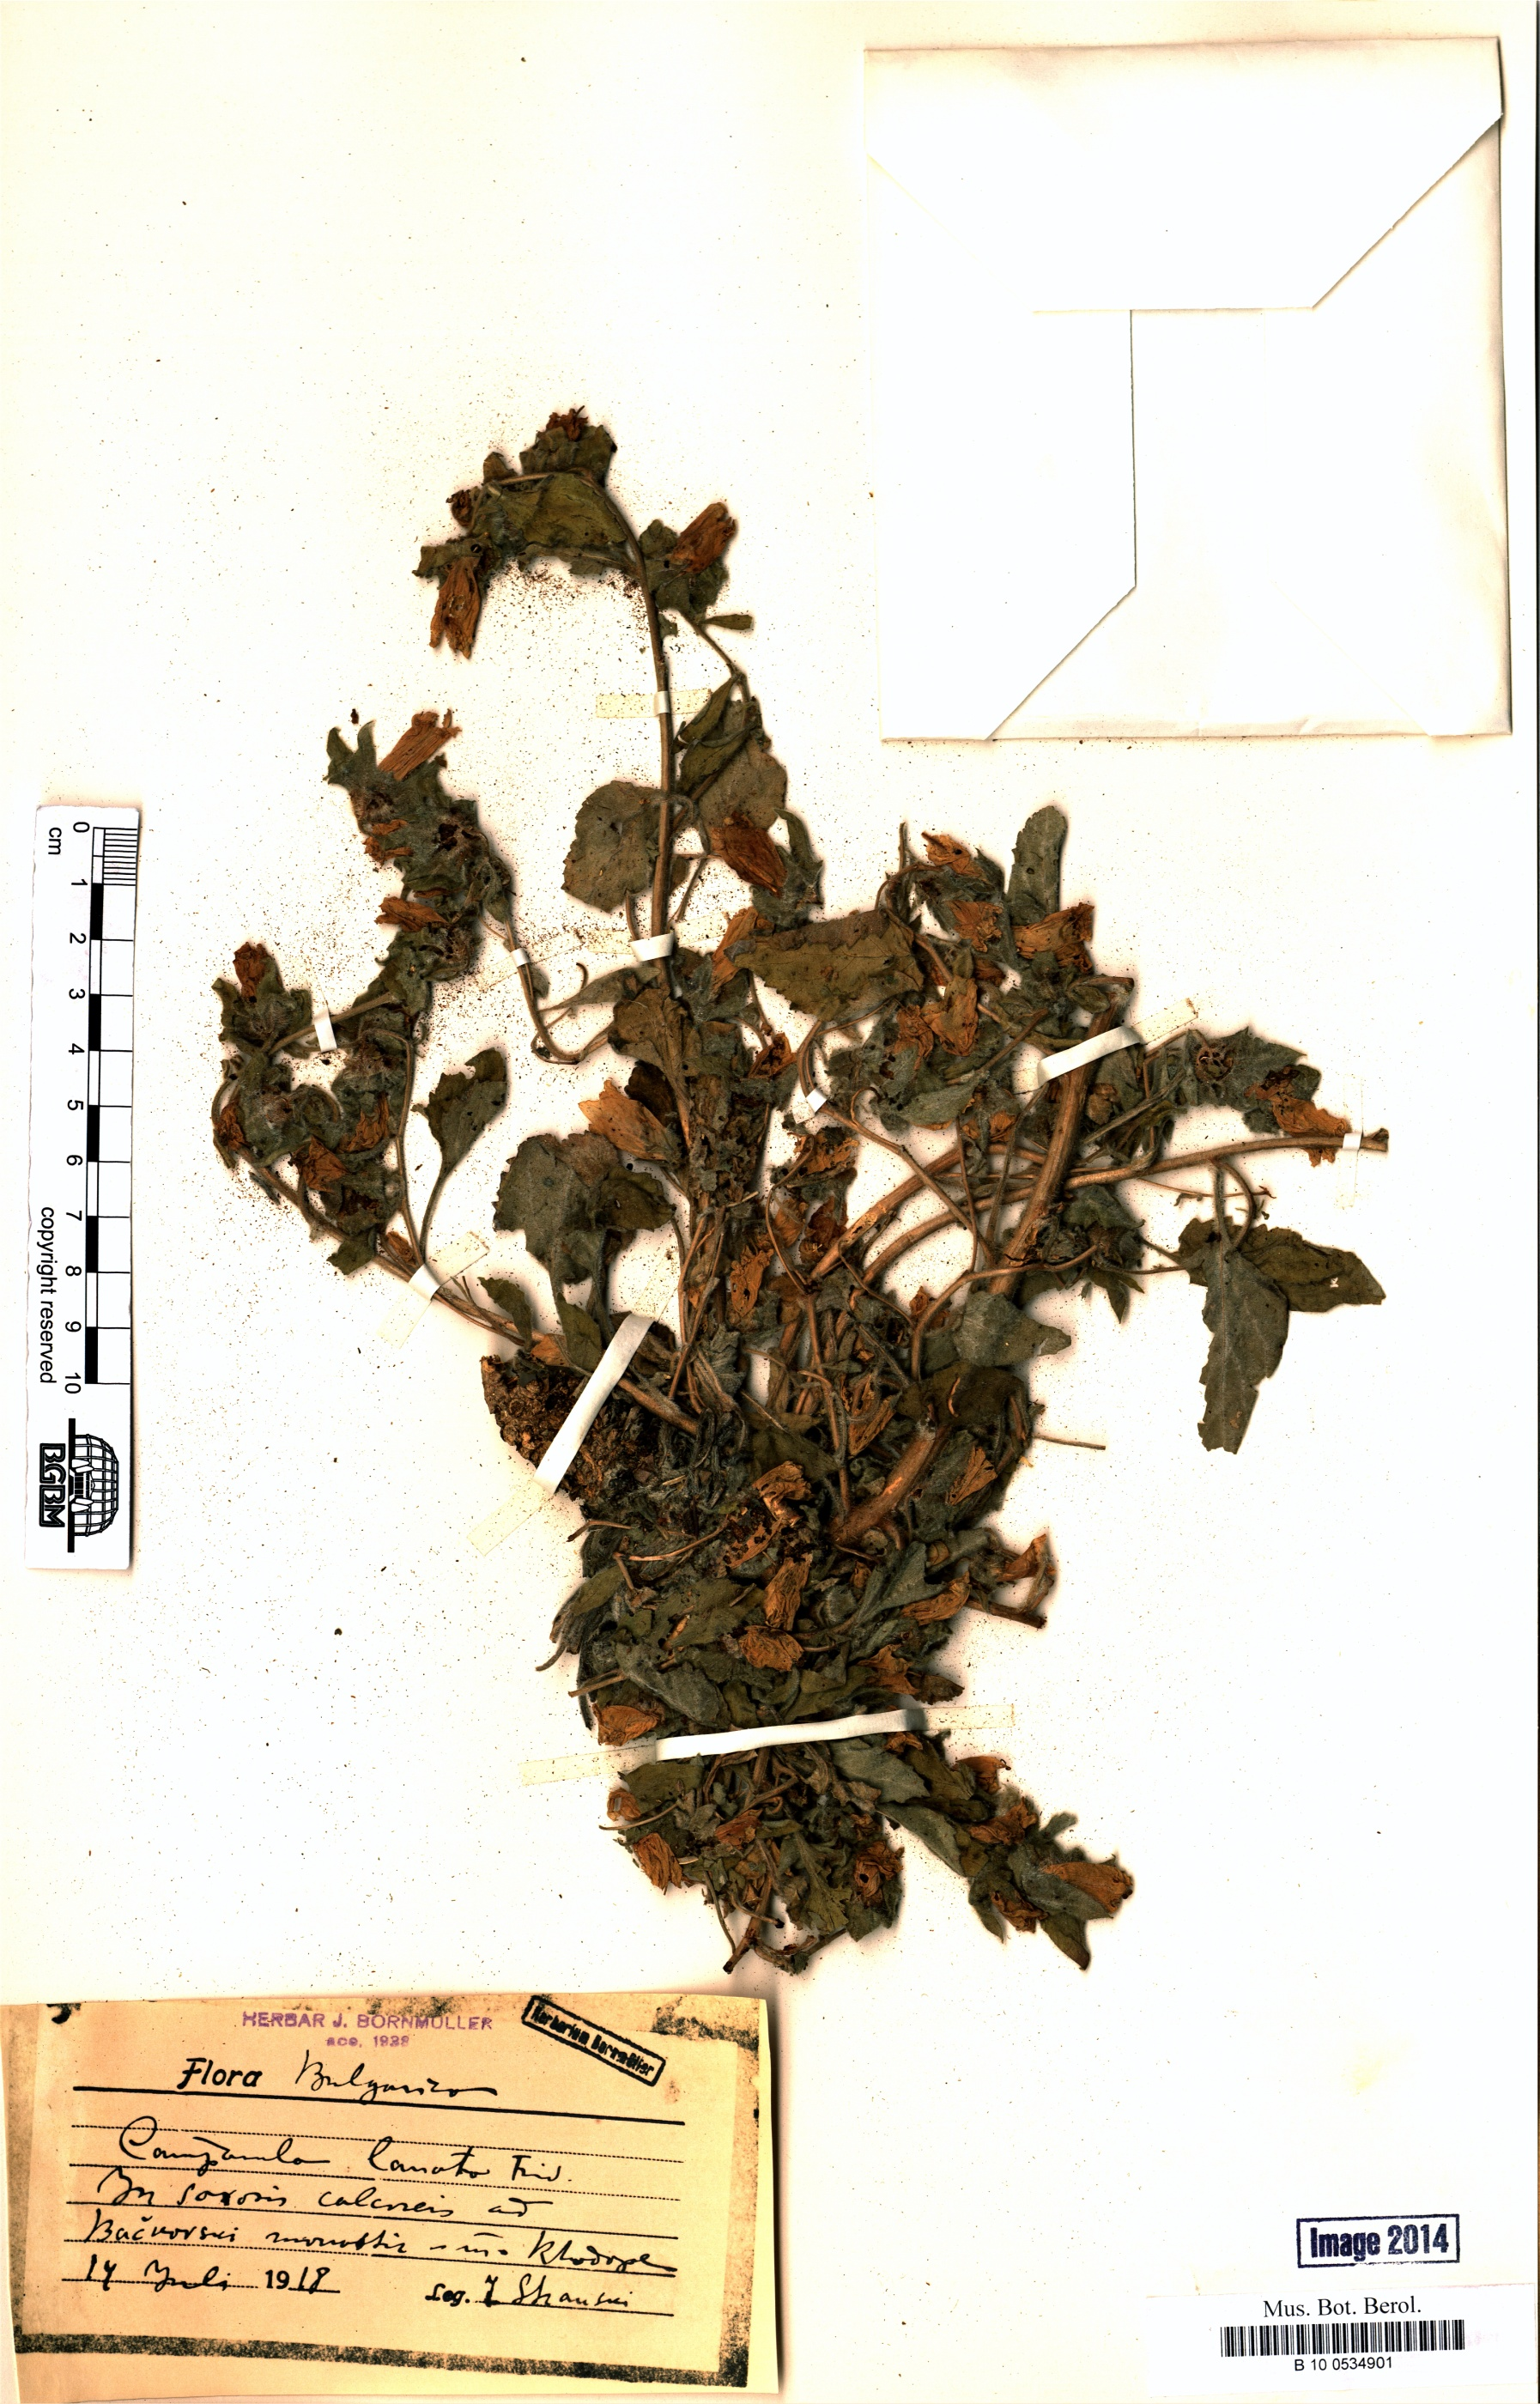 http://ww2.bgbm.org/herbarium/images/B/10/05/34/90/B_10_0534901.jpg